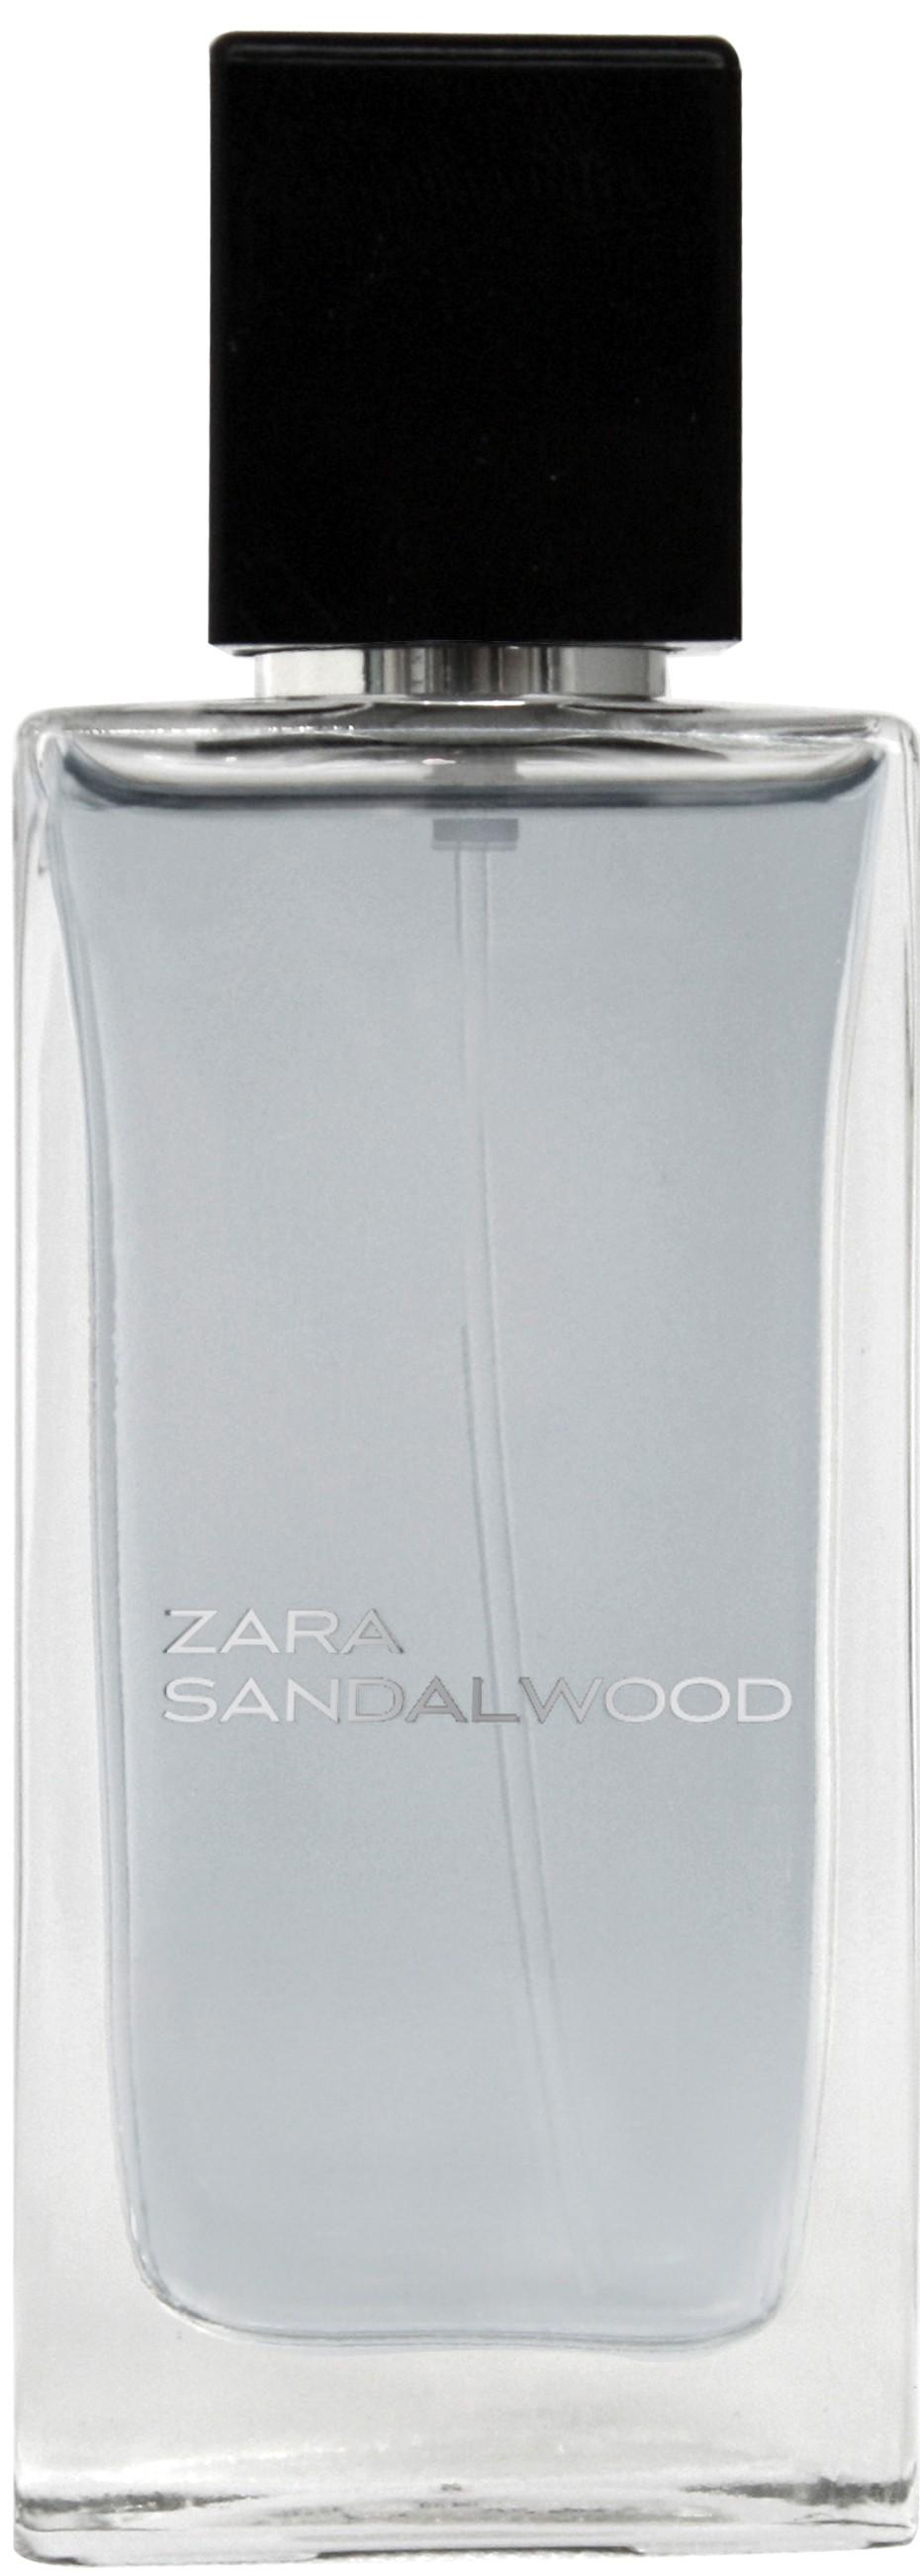 Zara Sandalwood аромат для мужчин